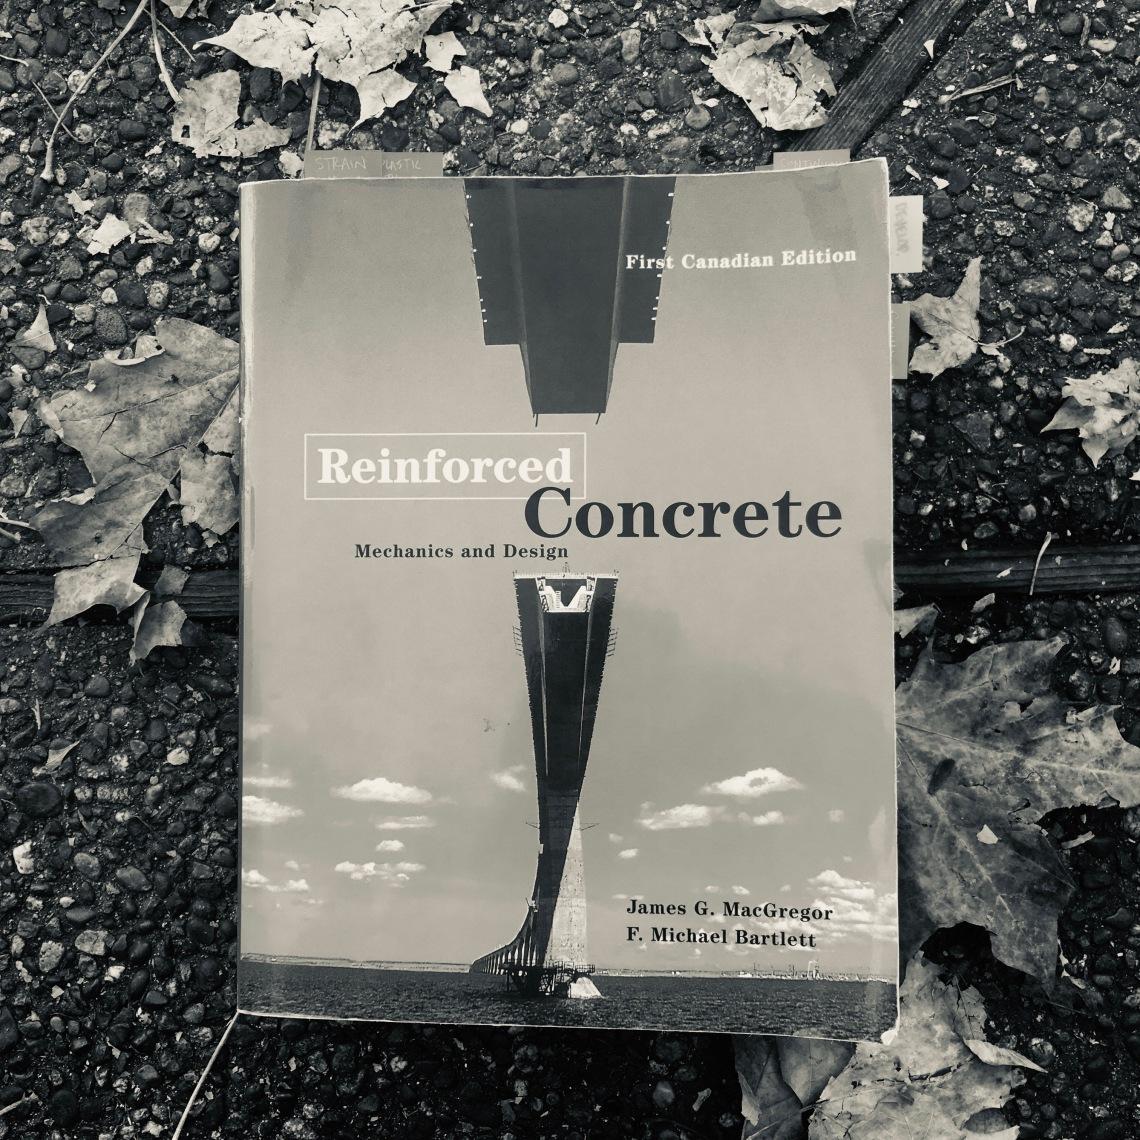 Reinforced Concrete Mechanics and Design (MacGregor Bartlett)